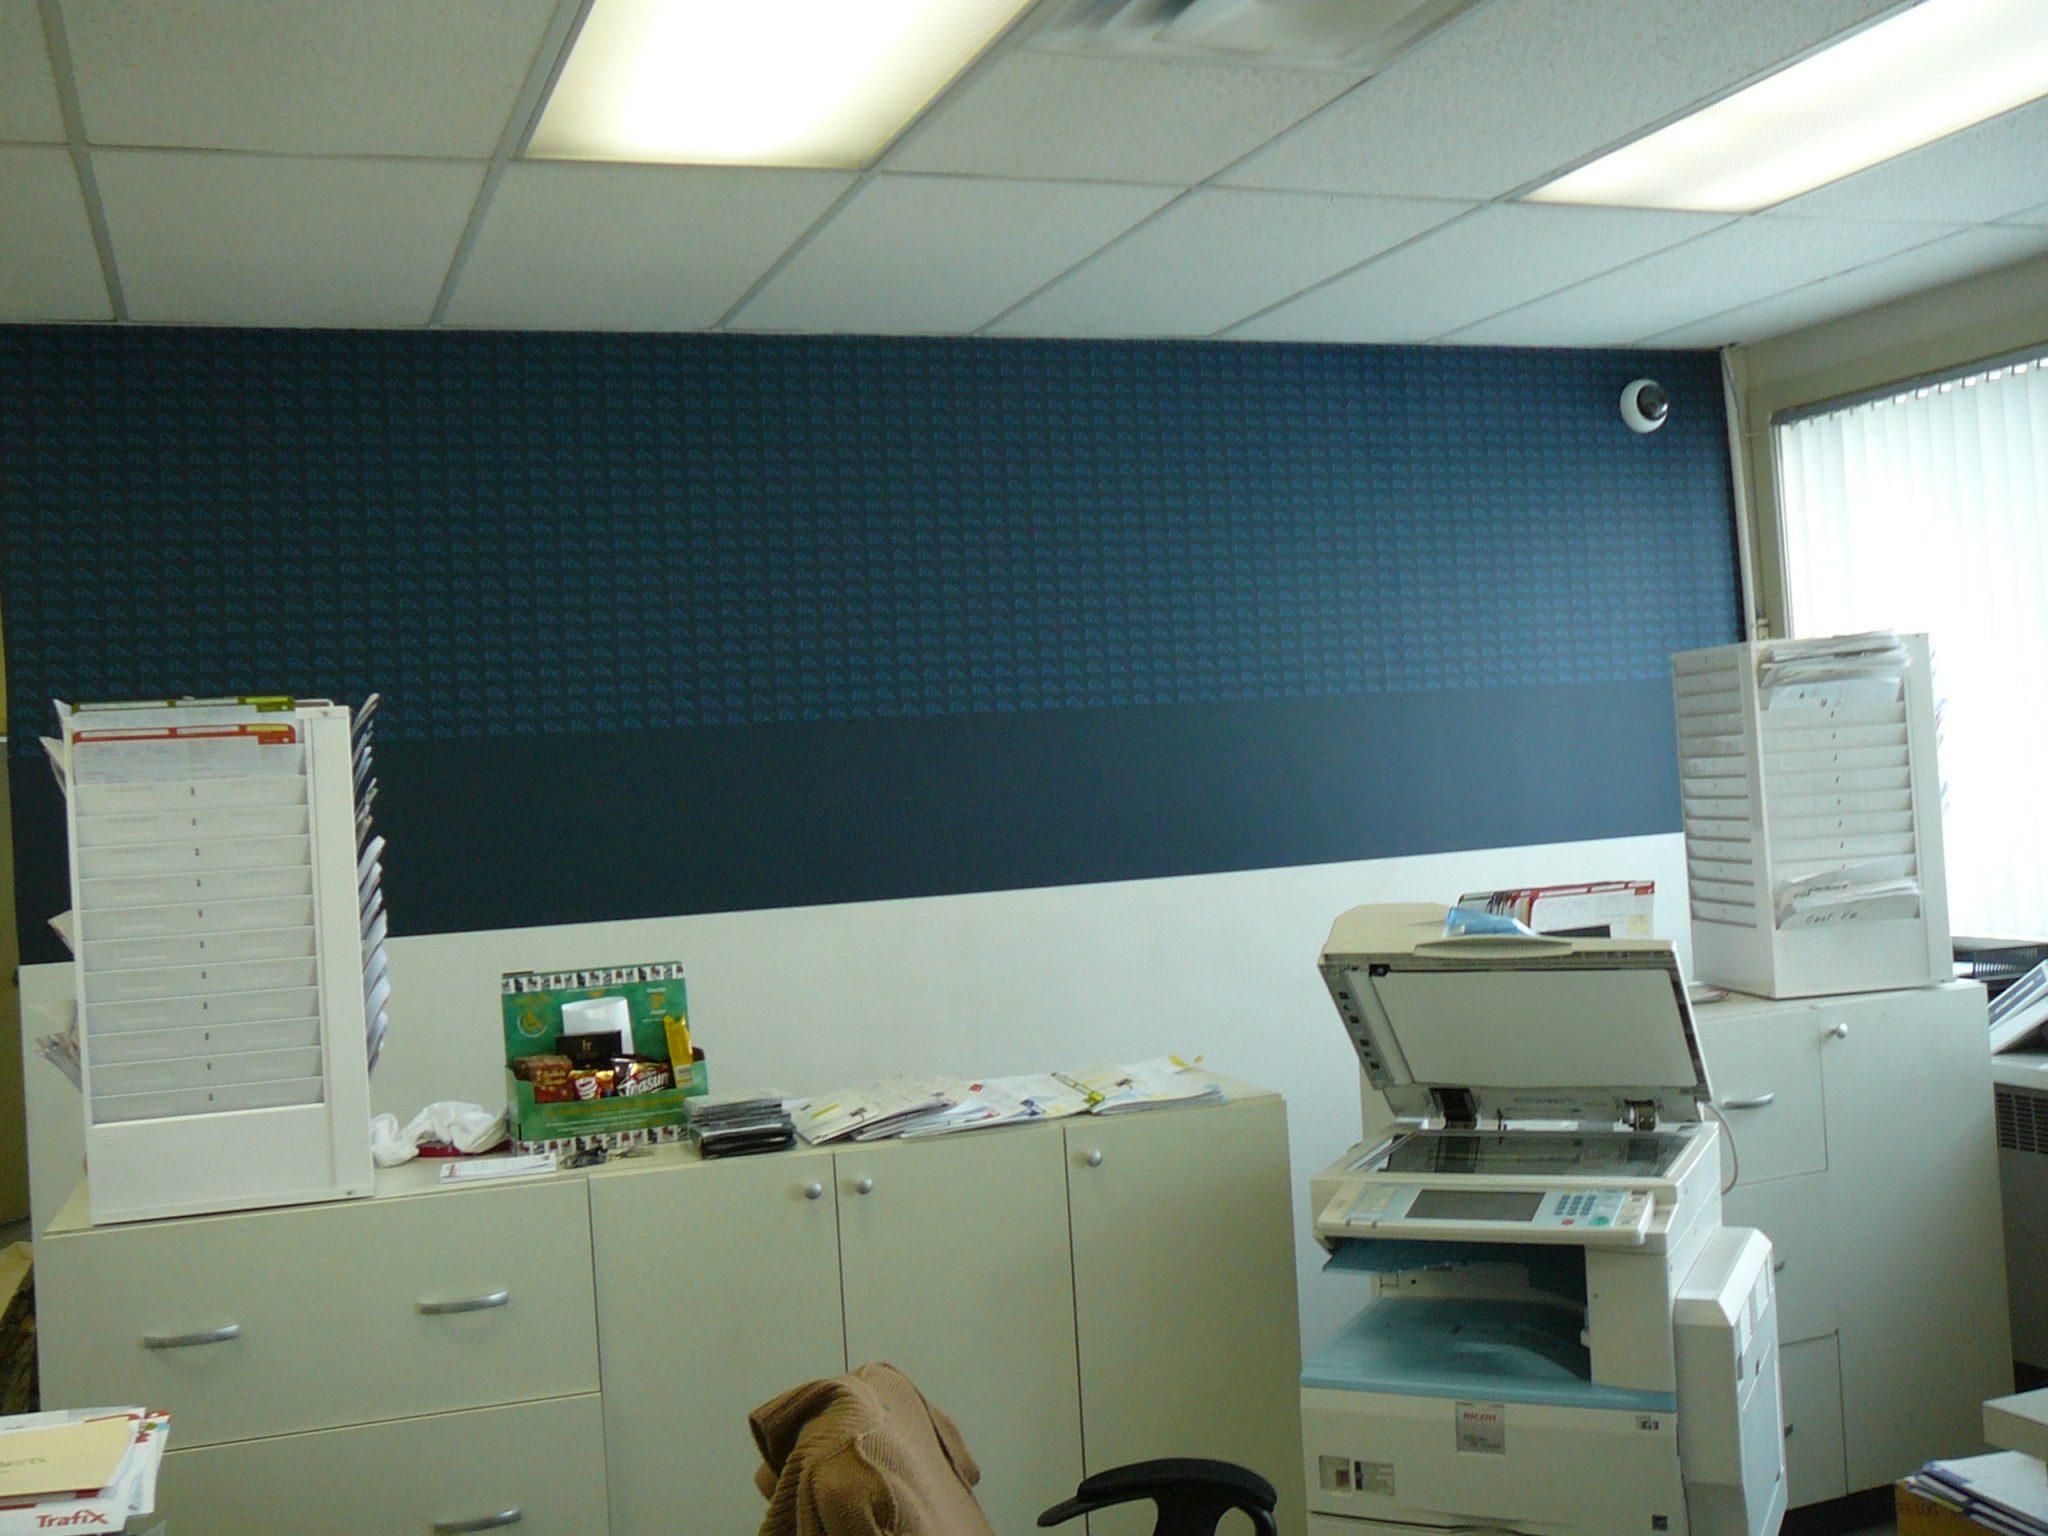 expert en installation de tapisserie commerciale dans la r gion de qu bec. Black Bedroom Furniture Sets. Home Design Ideas